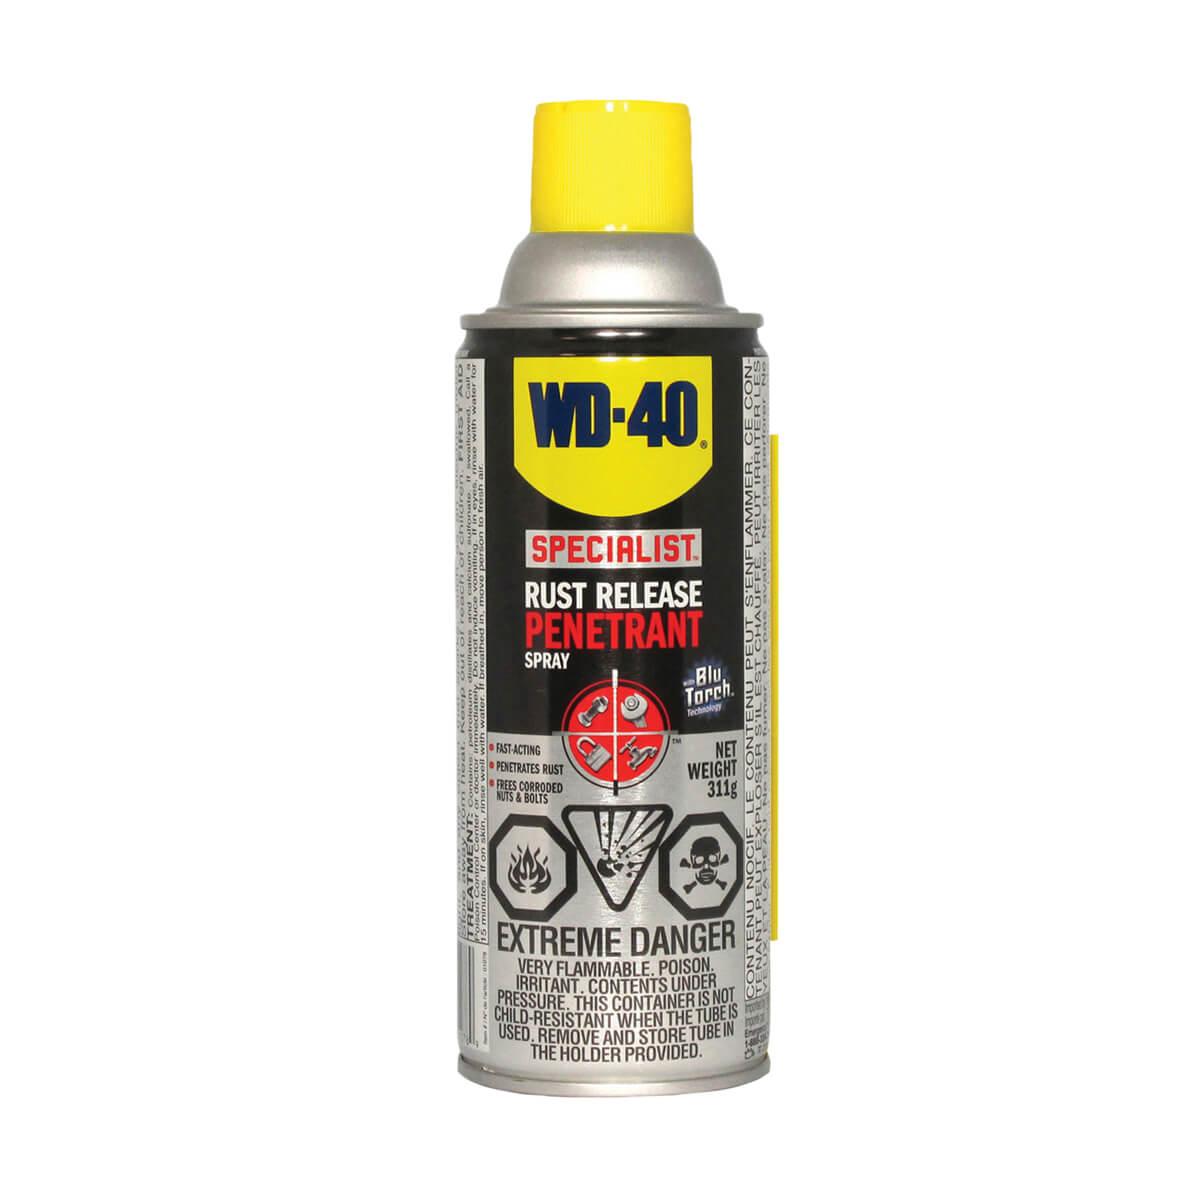 WD-40 Specialist Rust Release Penetrant - 311 g